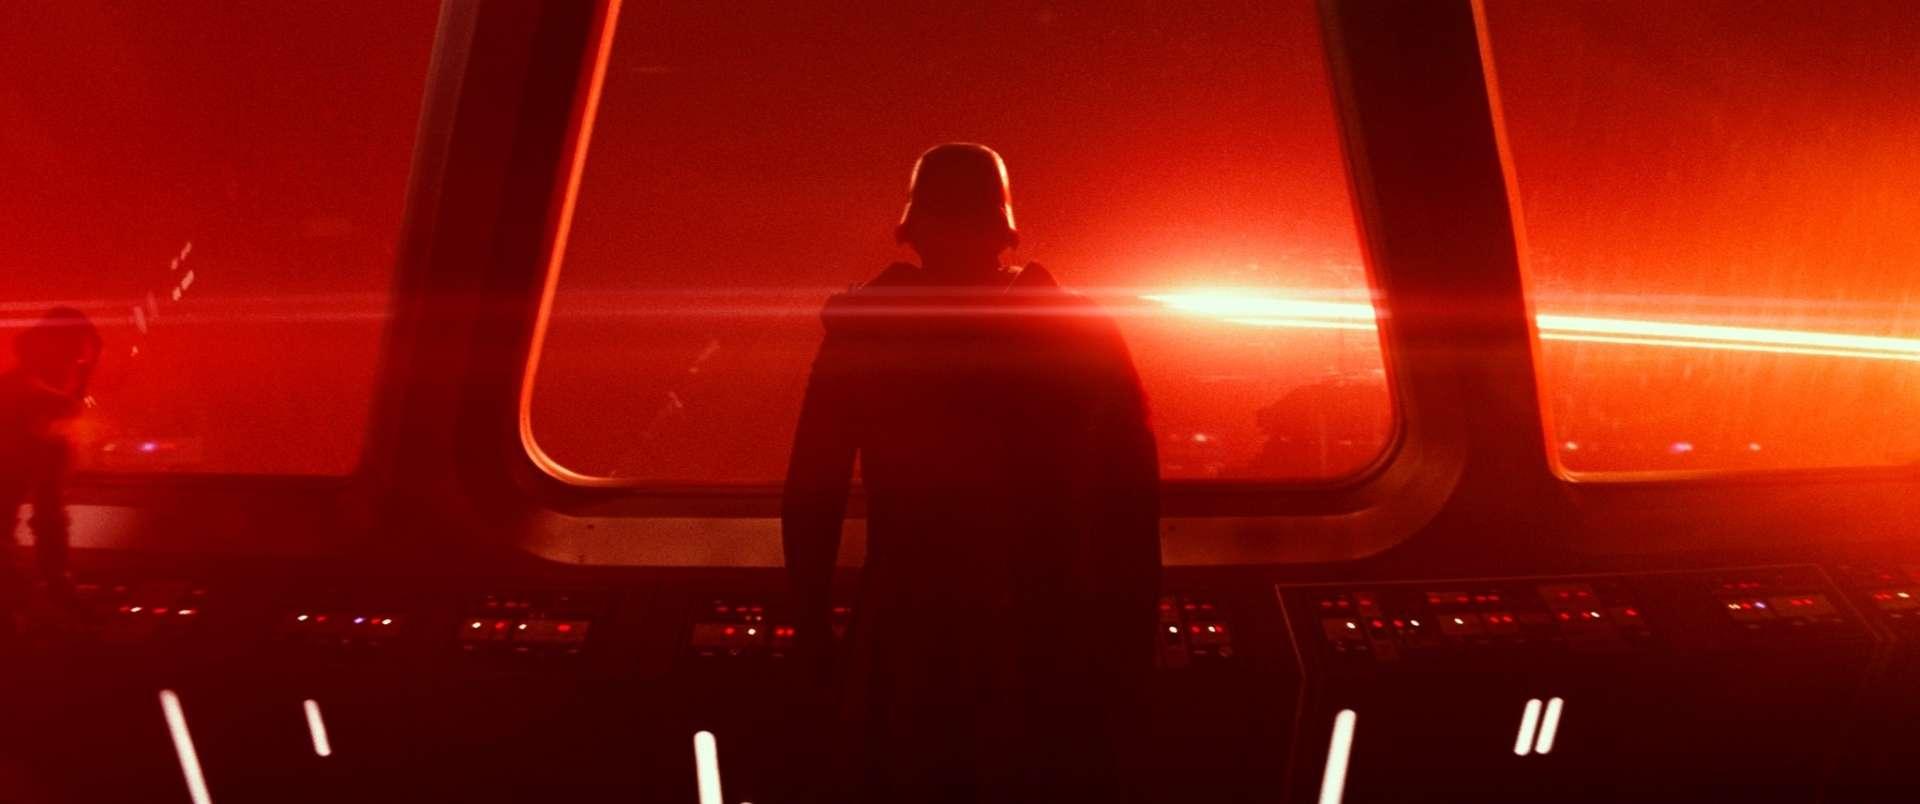 Star Wars Episode VII The Force Awakens Wallpaper 051